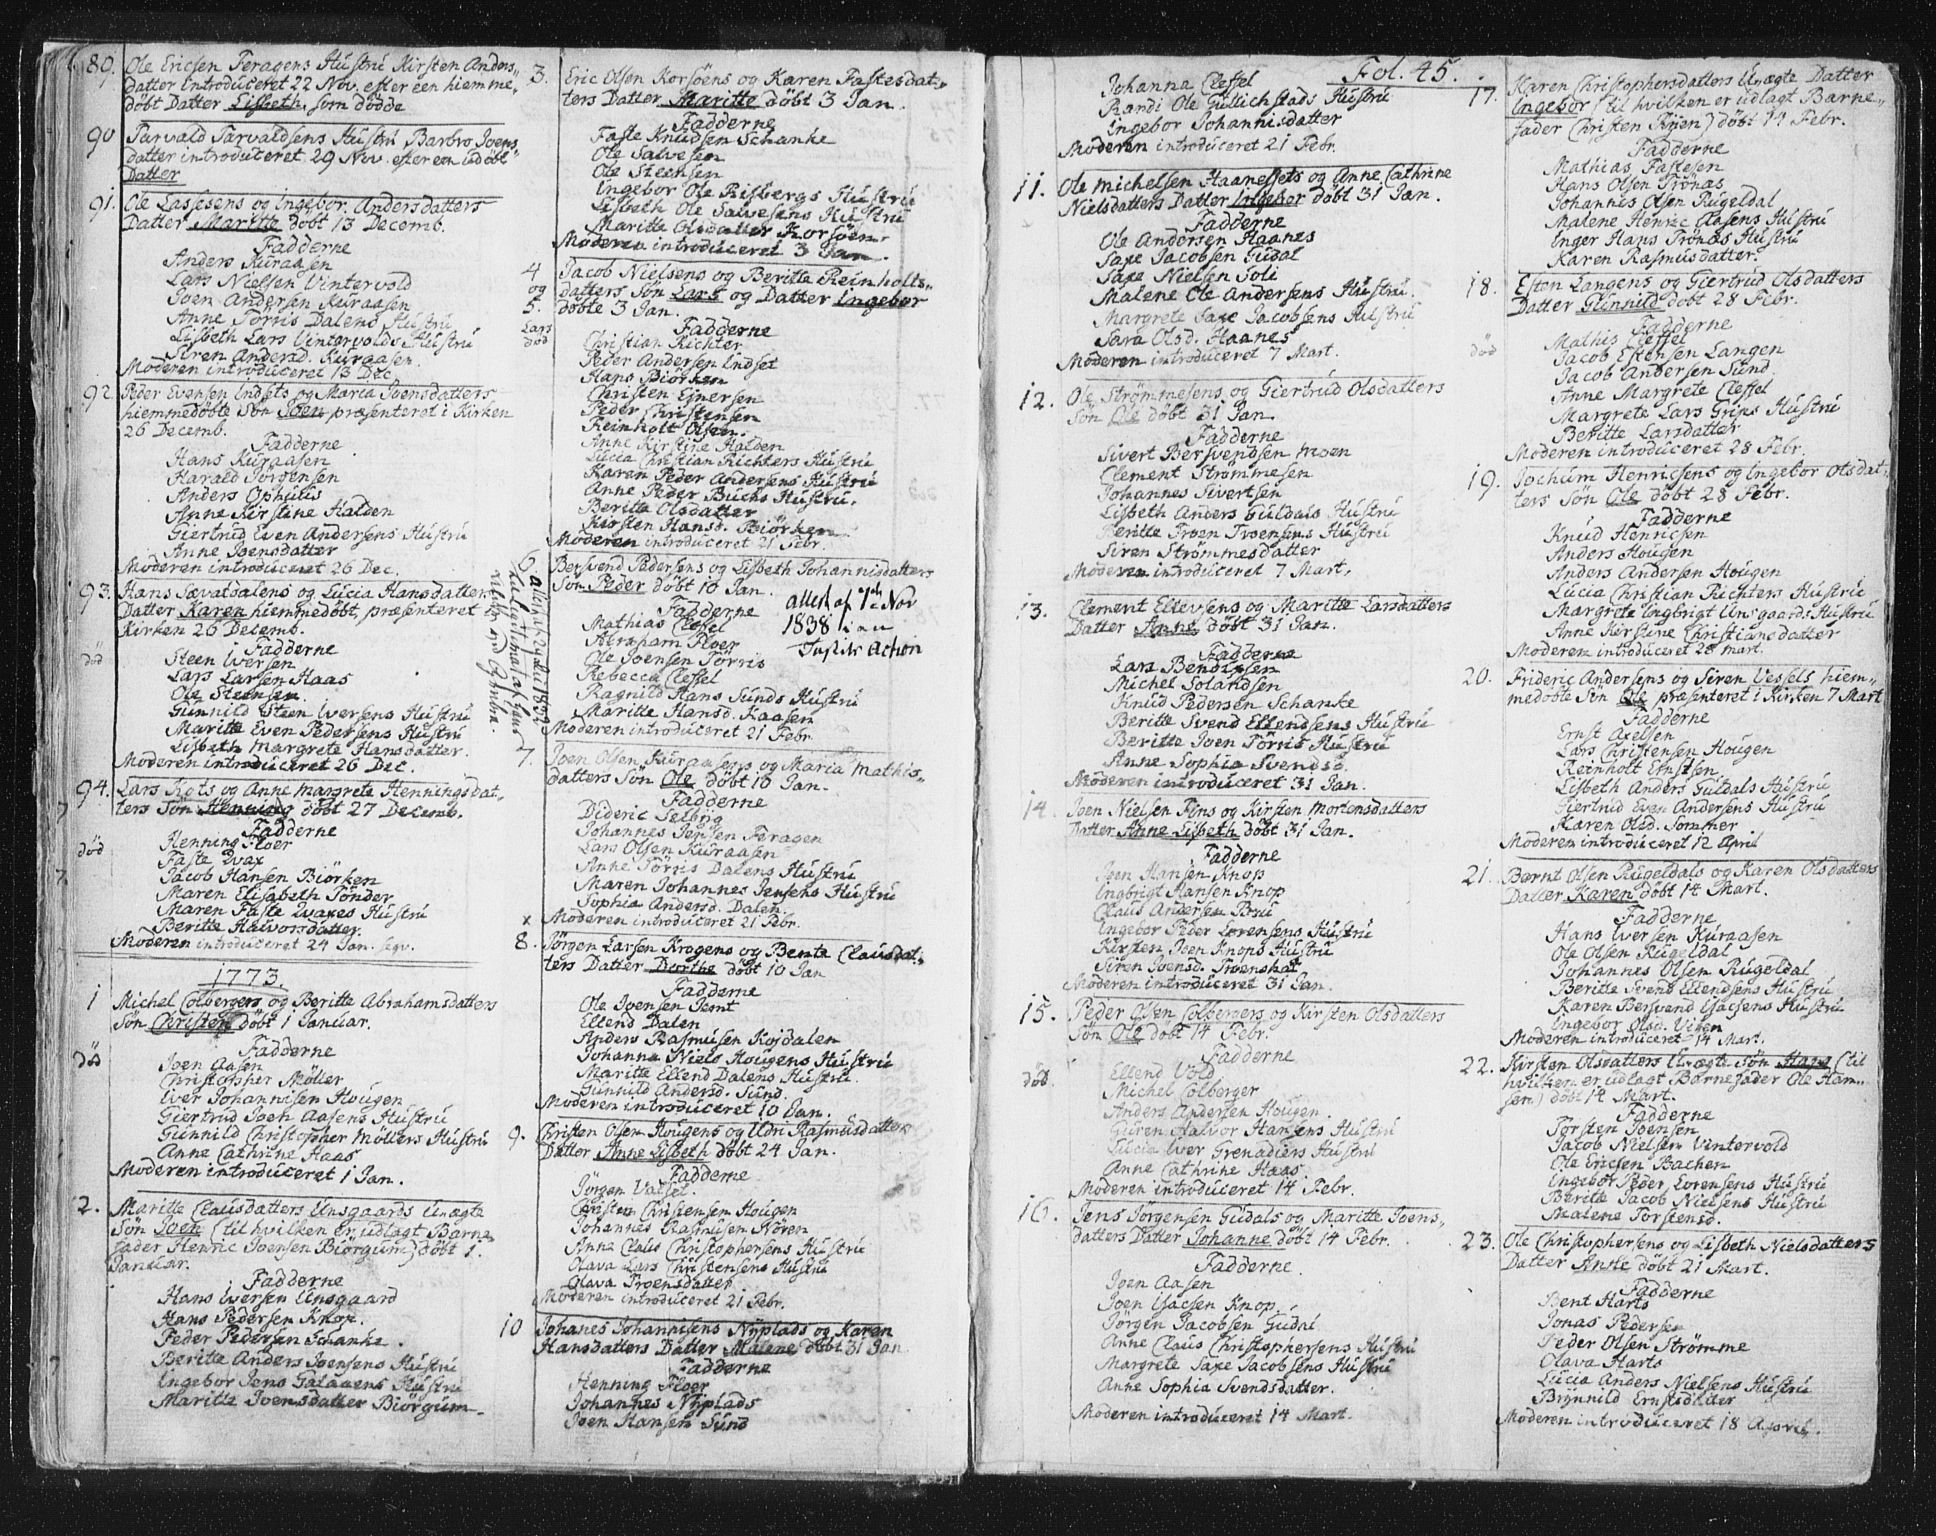 SAT, Ministerialprotokoller, klokkerbøker og fødselsregistre - Sør-Trøndelag, 681/L0926: Parish register (official) no. 681A04, 1767-1797, p. 45